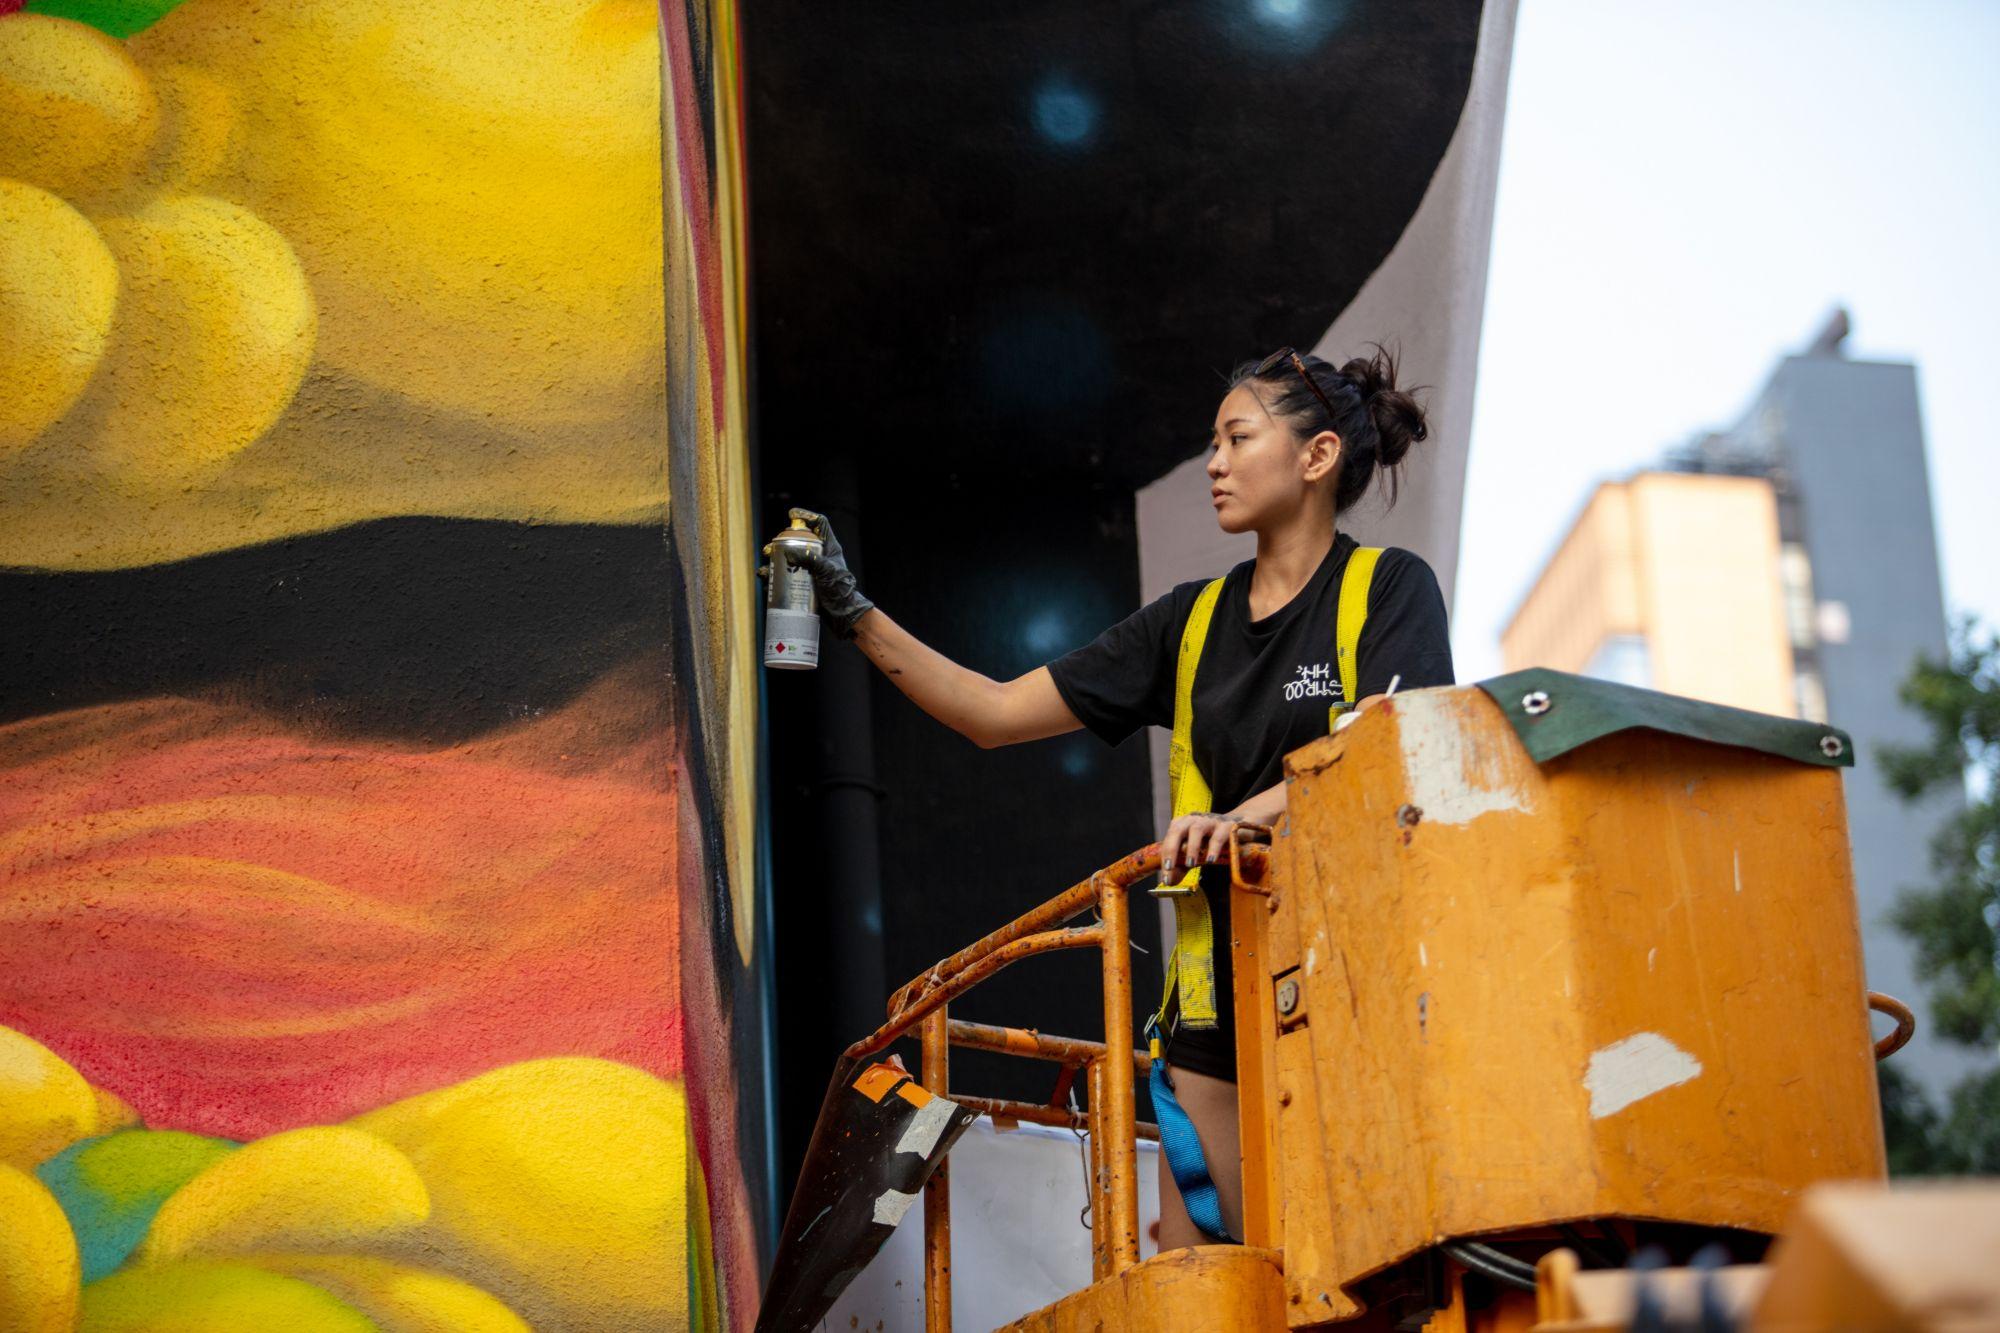 HKwalls Street Art Festival Returns This May 2021 In Sai Kung